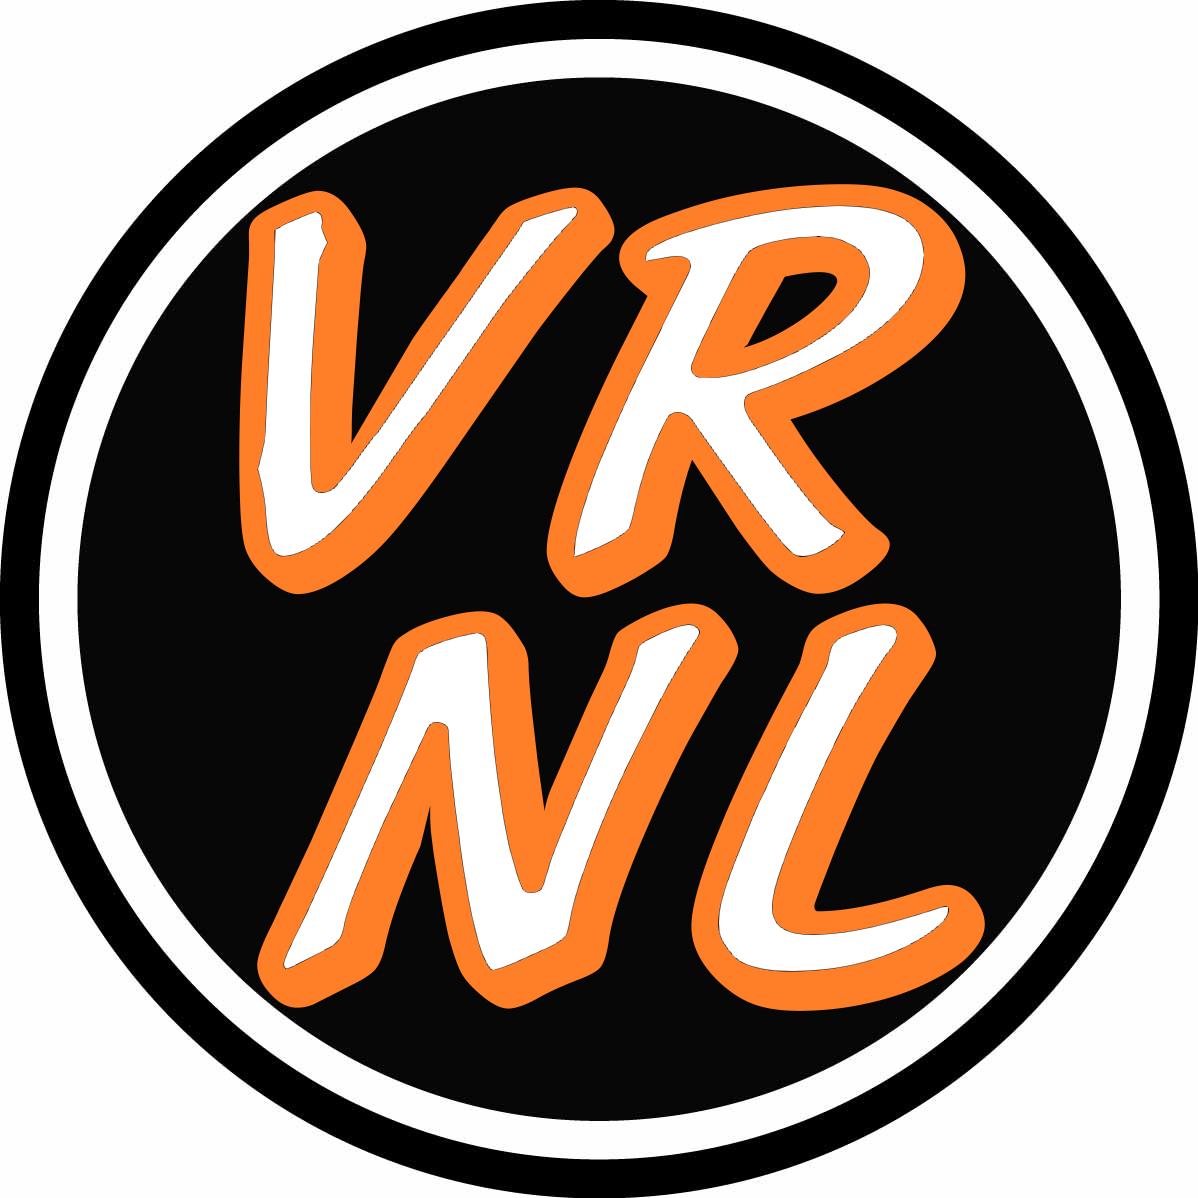 logo VRNL ow bw-circle